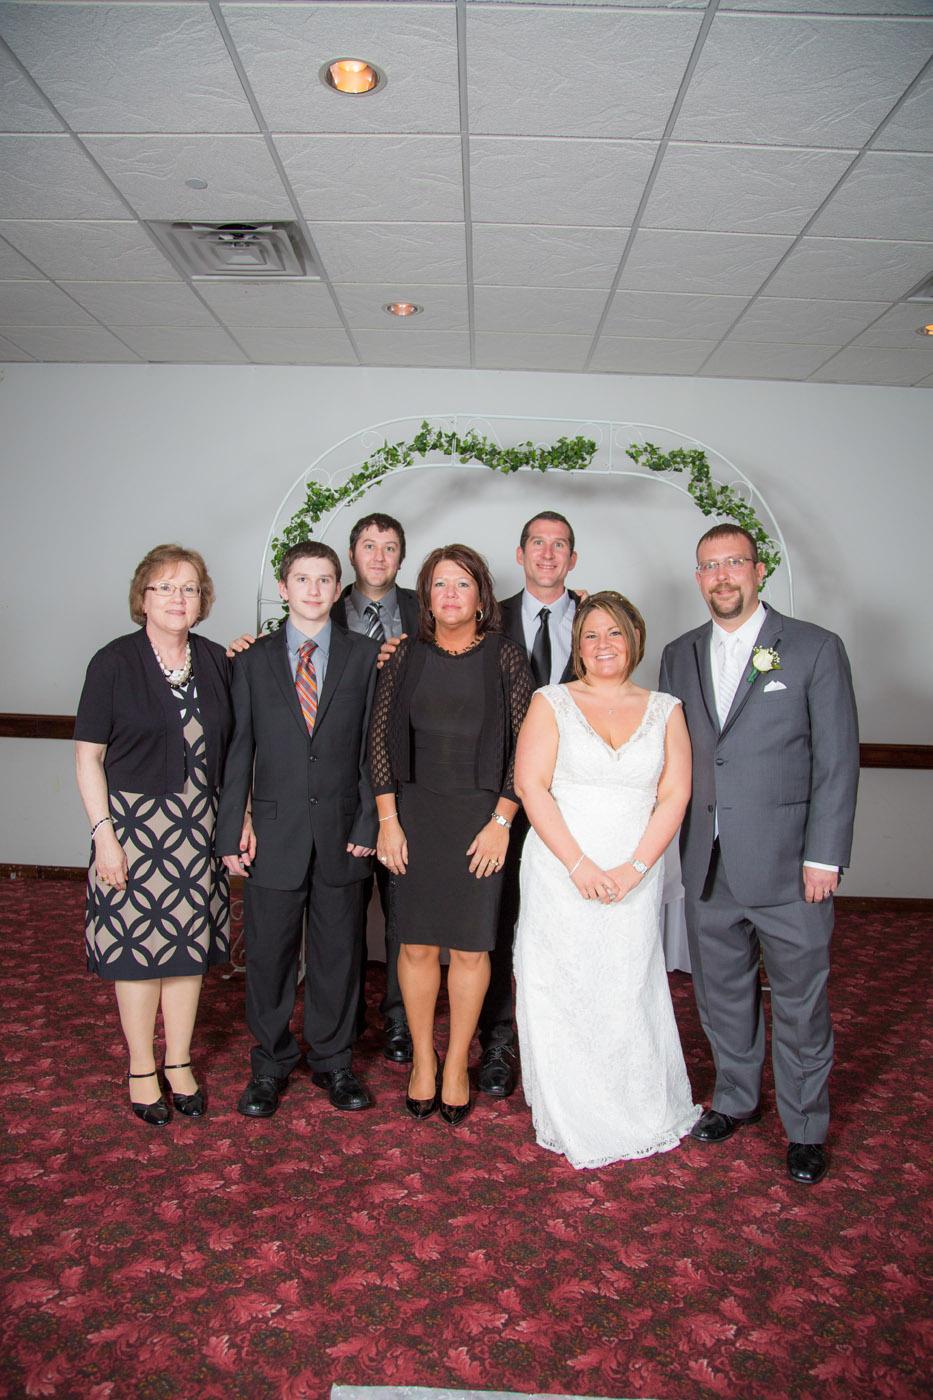 Healy Wedding 1 1425.jpg